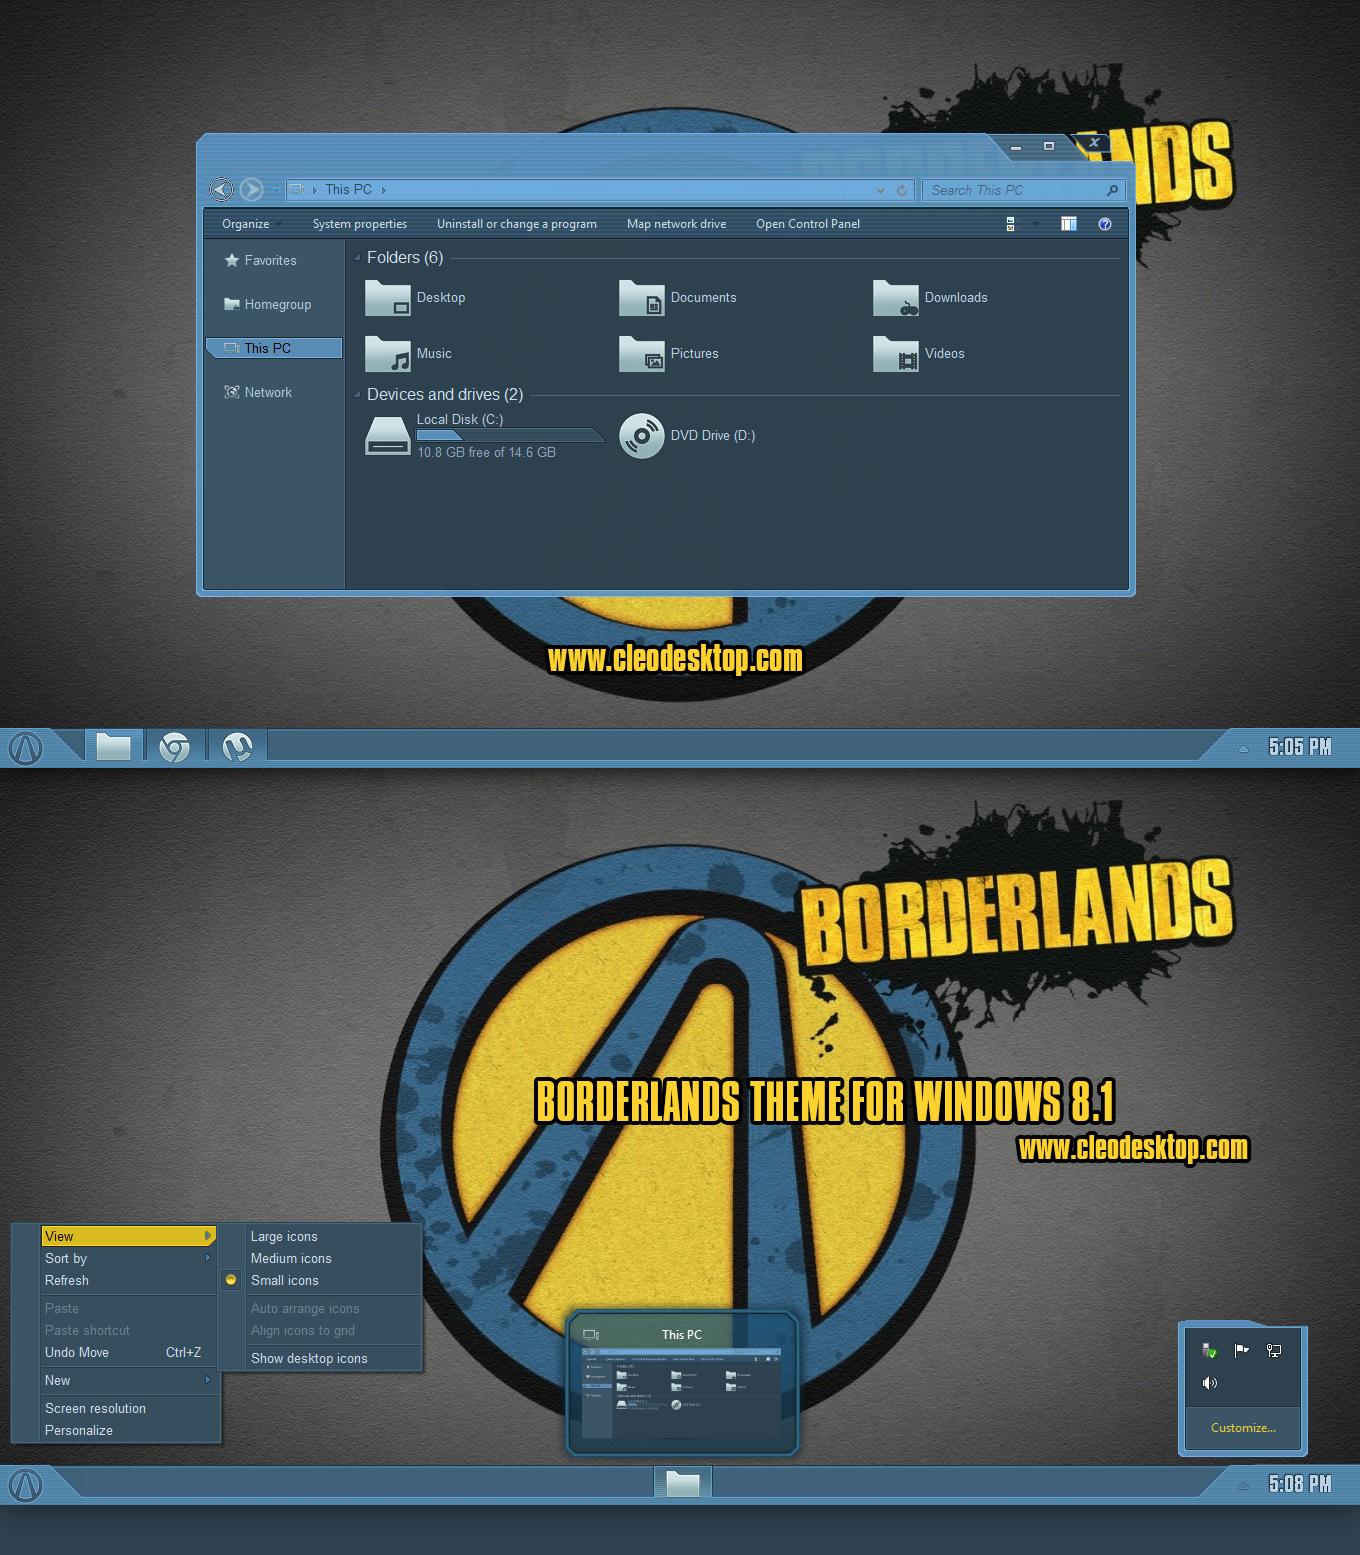 Borderlands Theme For Windows 8.1